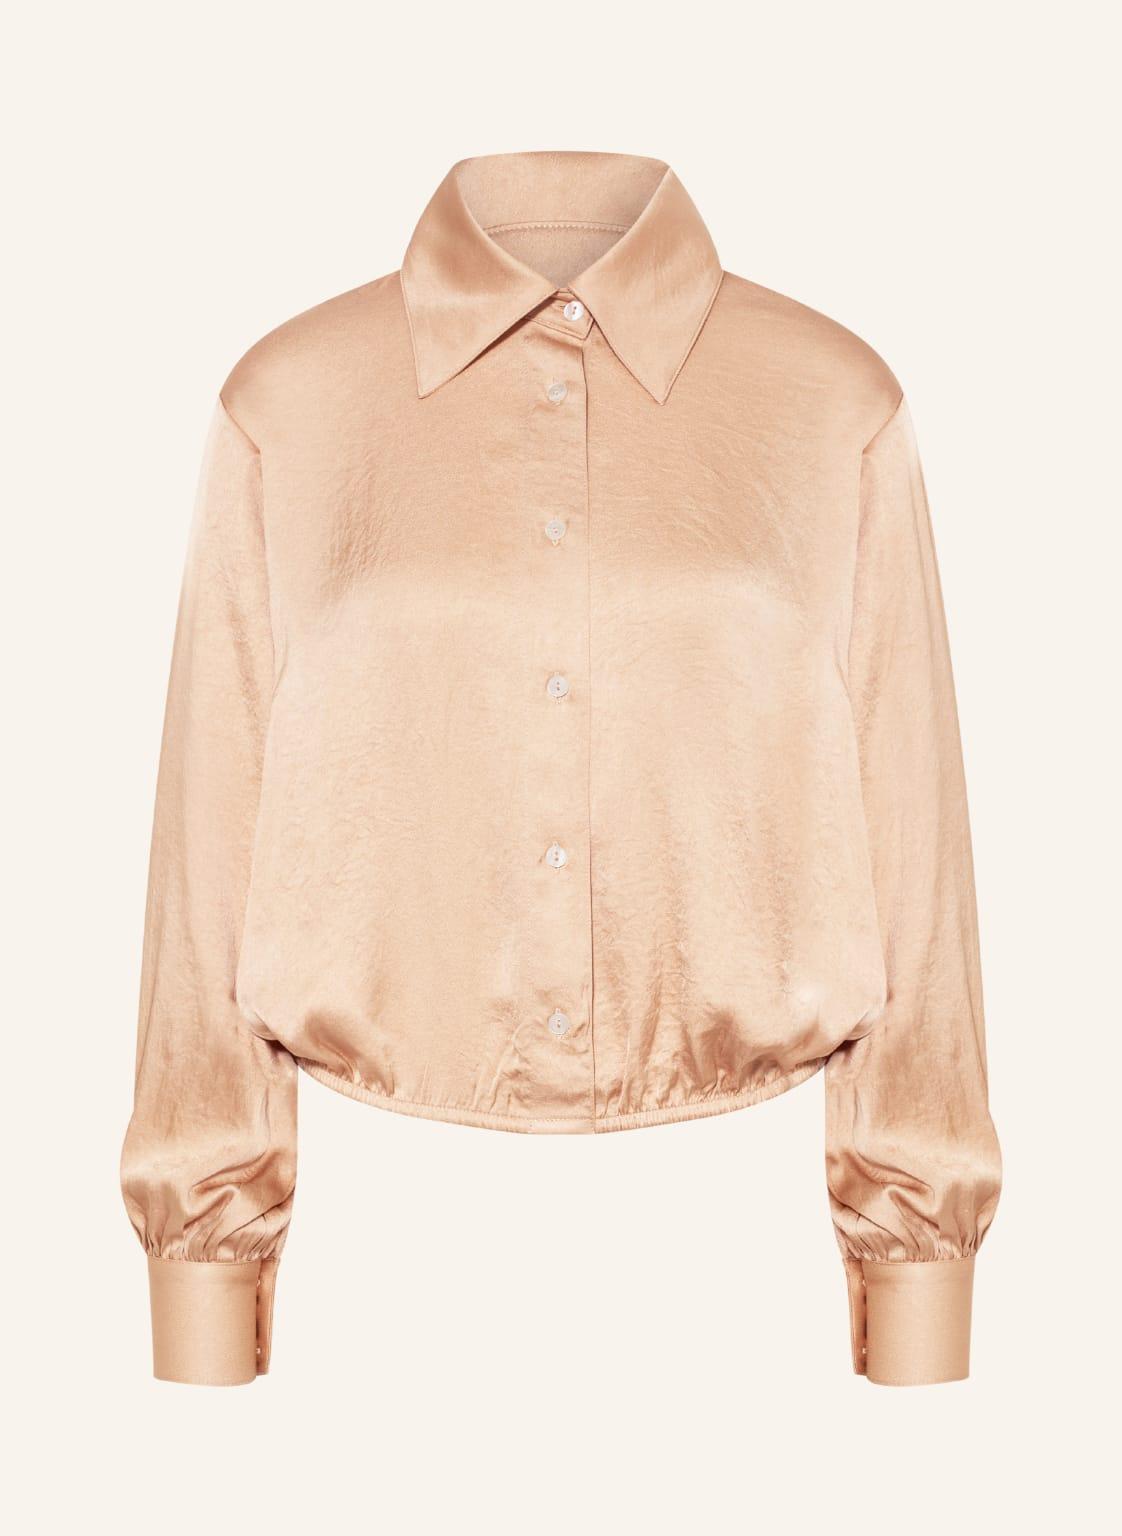 Image of American Vintage Hemdbluse Widland braun